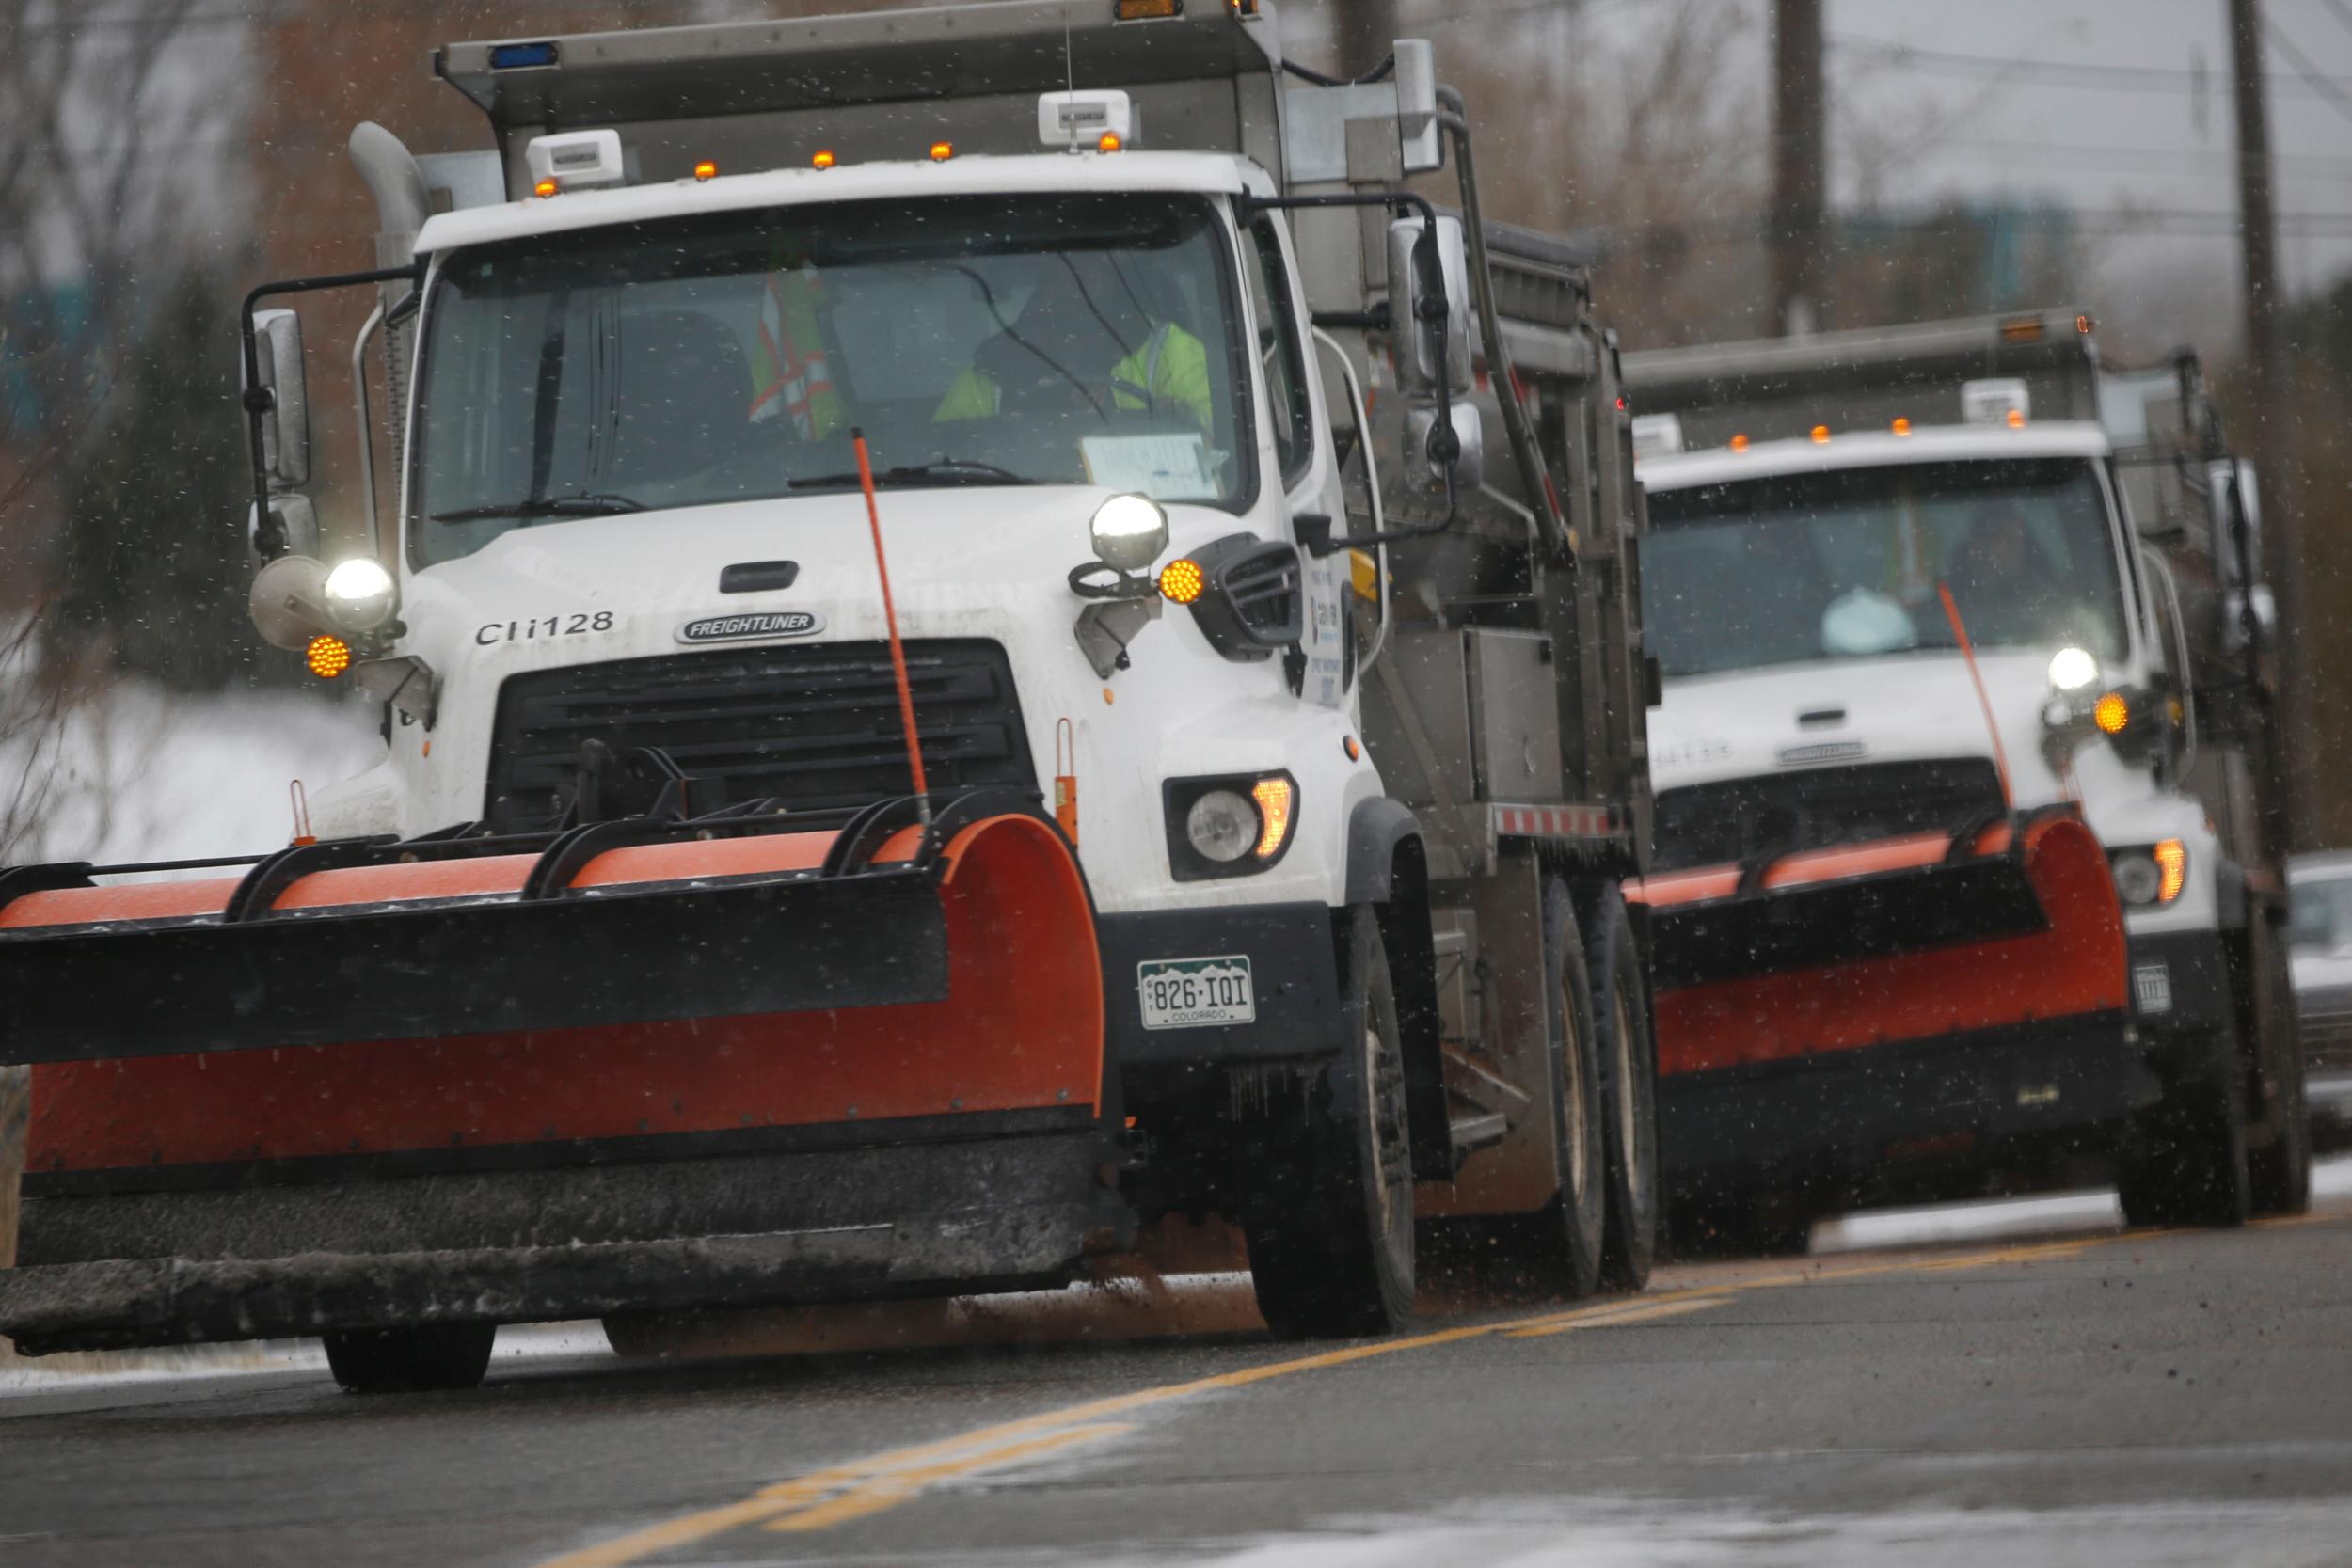 Buyers Beware: Ice Storm Poses Black Friday Threat